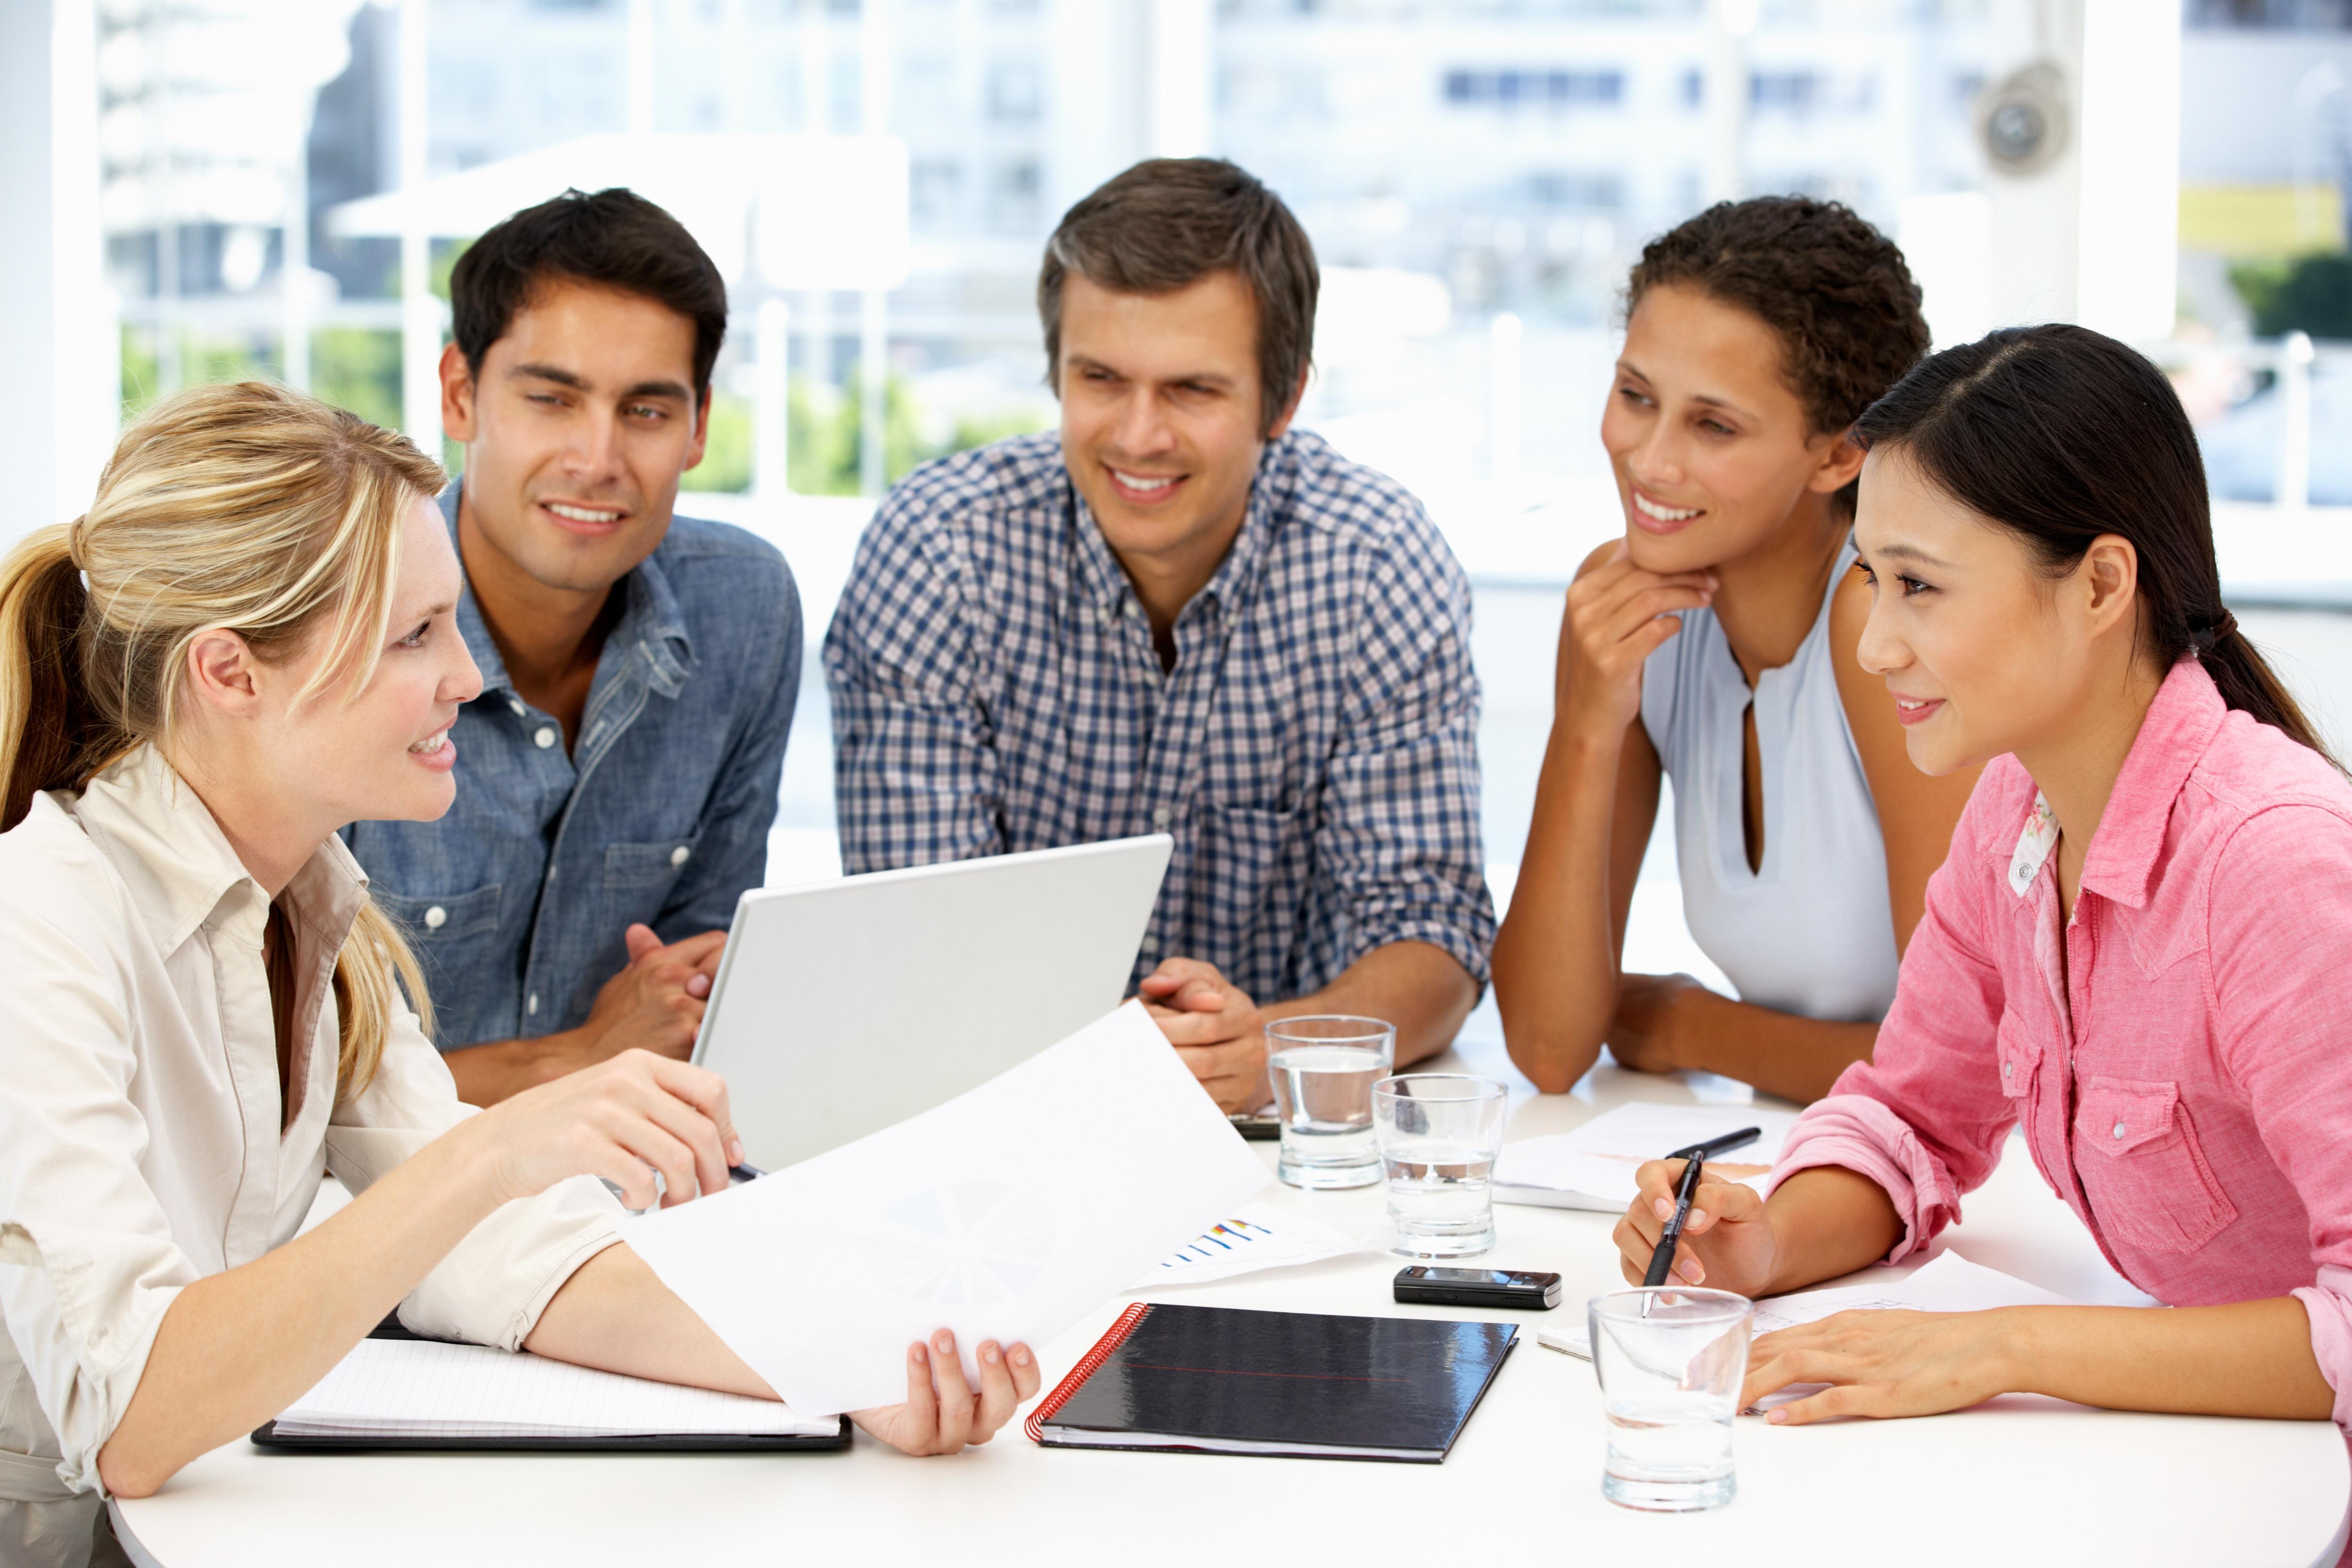 Strategies for Terrific Team Presentations